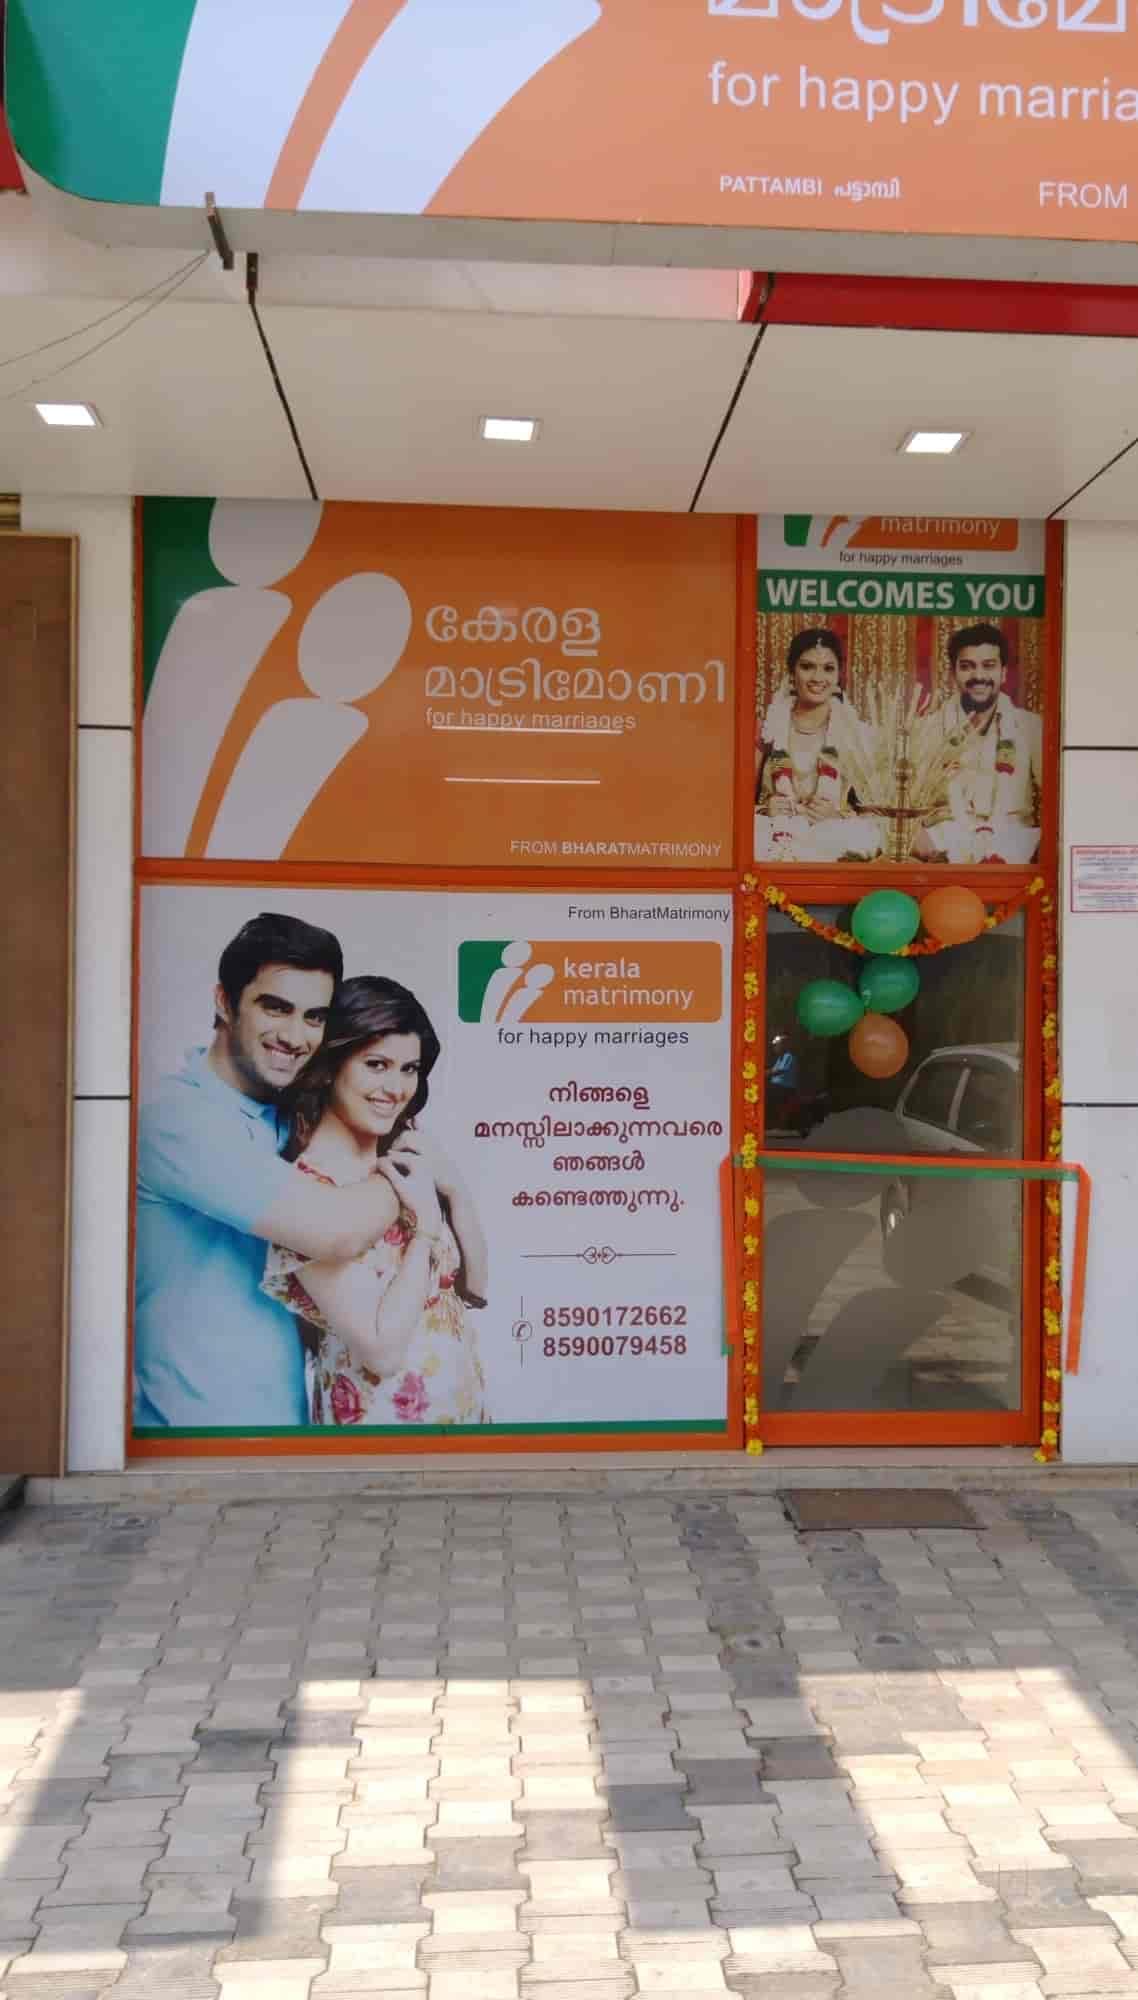 Bharat Matrimony, Pattambi - Matrimonial Bureaus in Palakkad - Justdial